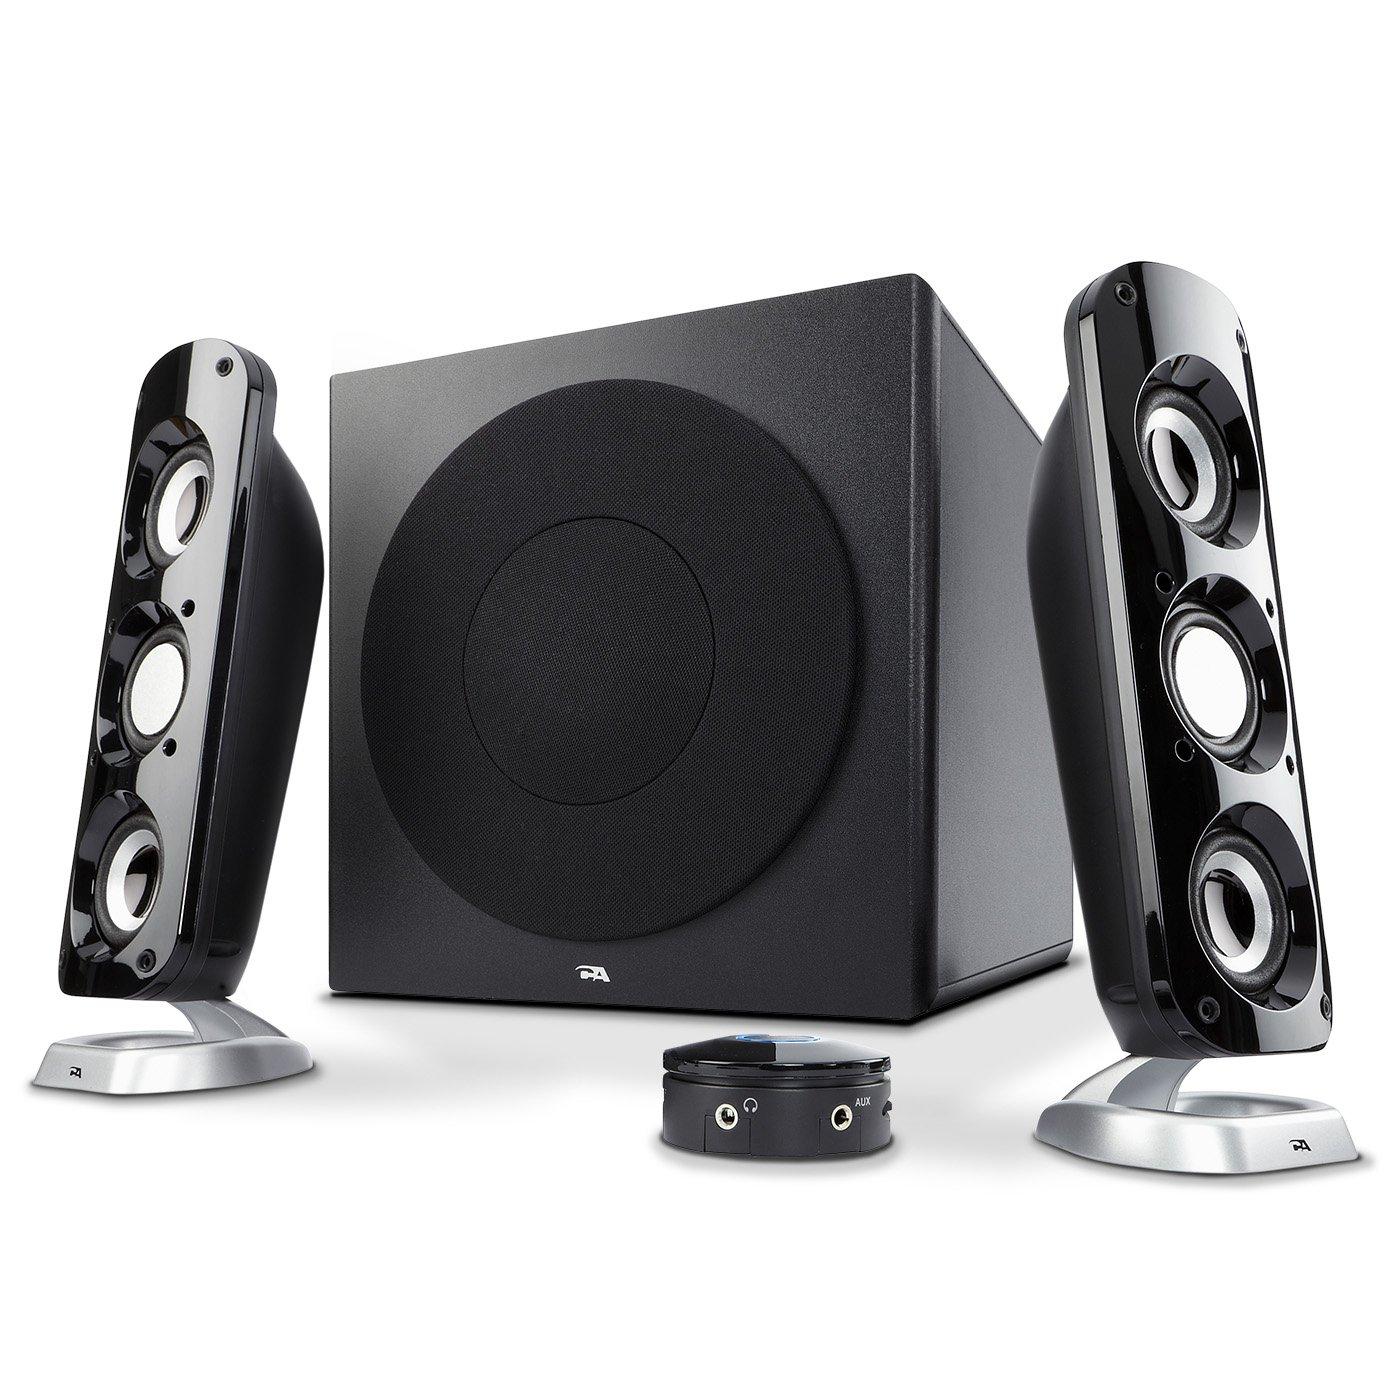 Cyber Acoustics CA-3908 Subwoofer Speaker